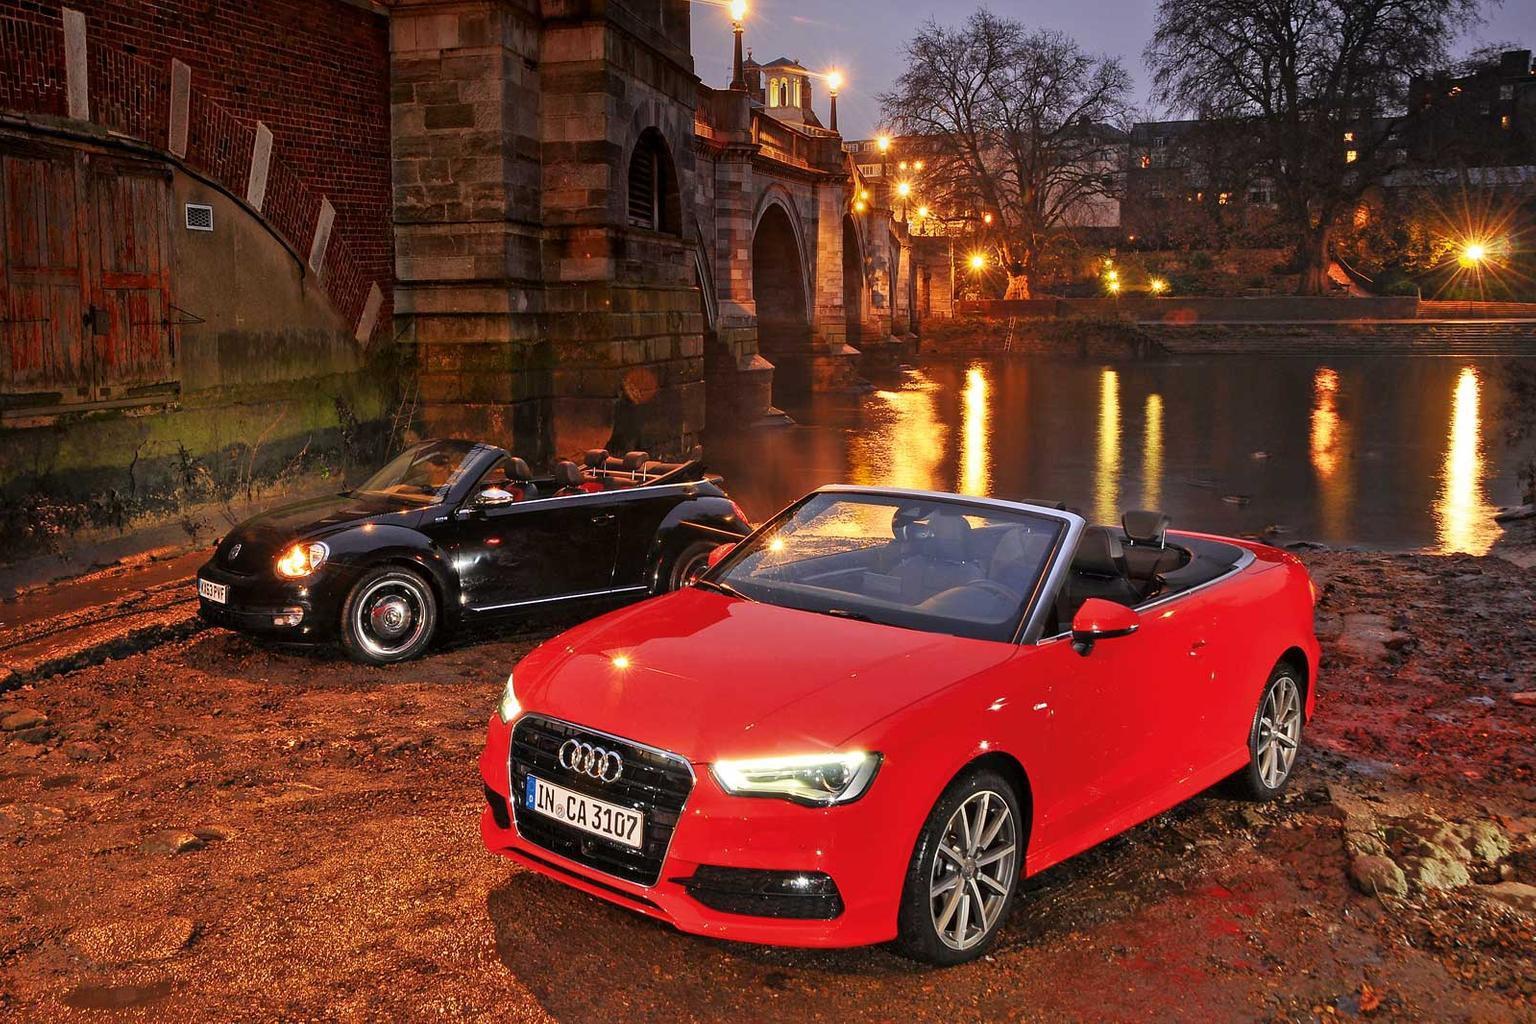 Audi A3 Cabriolet vs VW Beetle Cabriolet